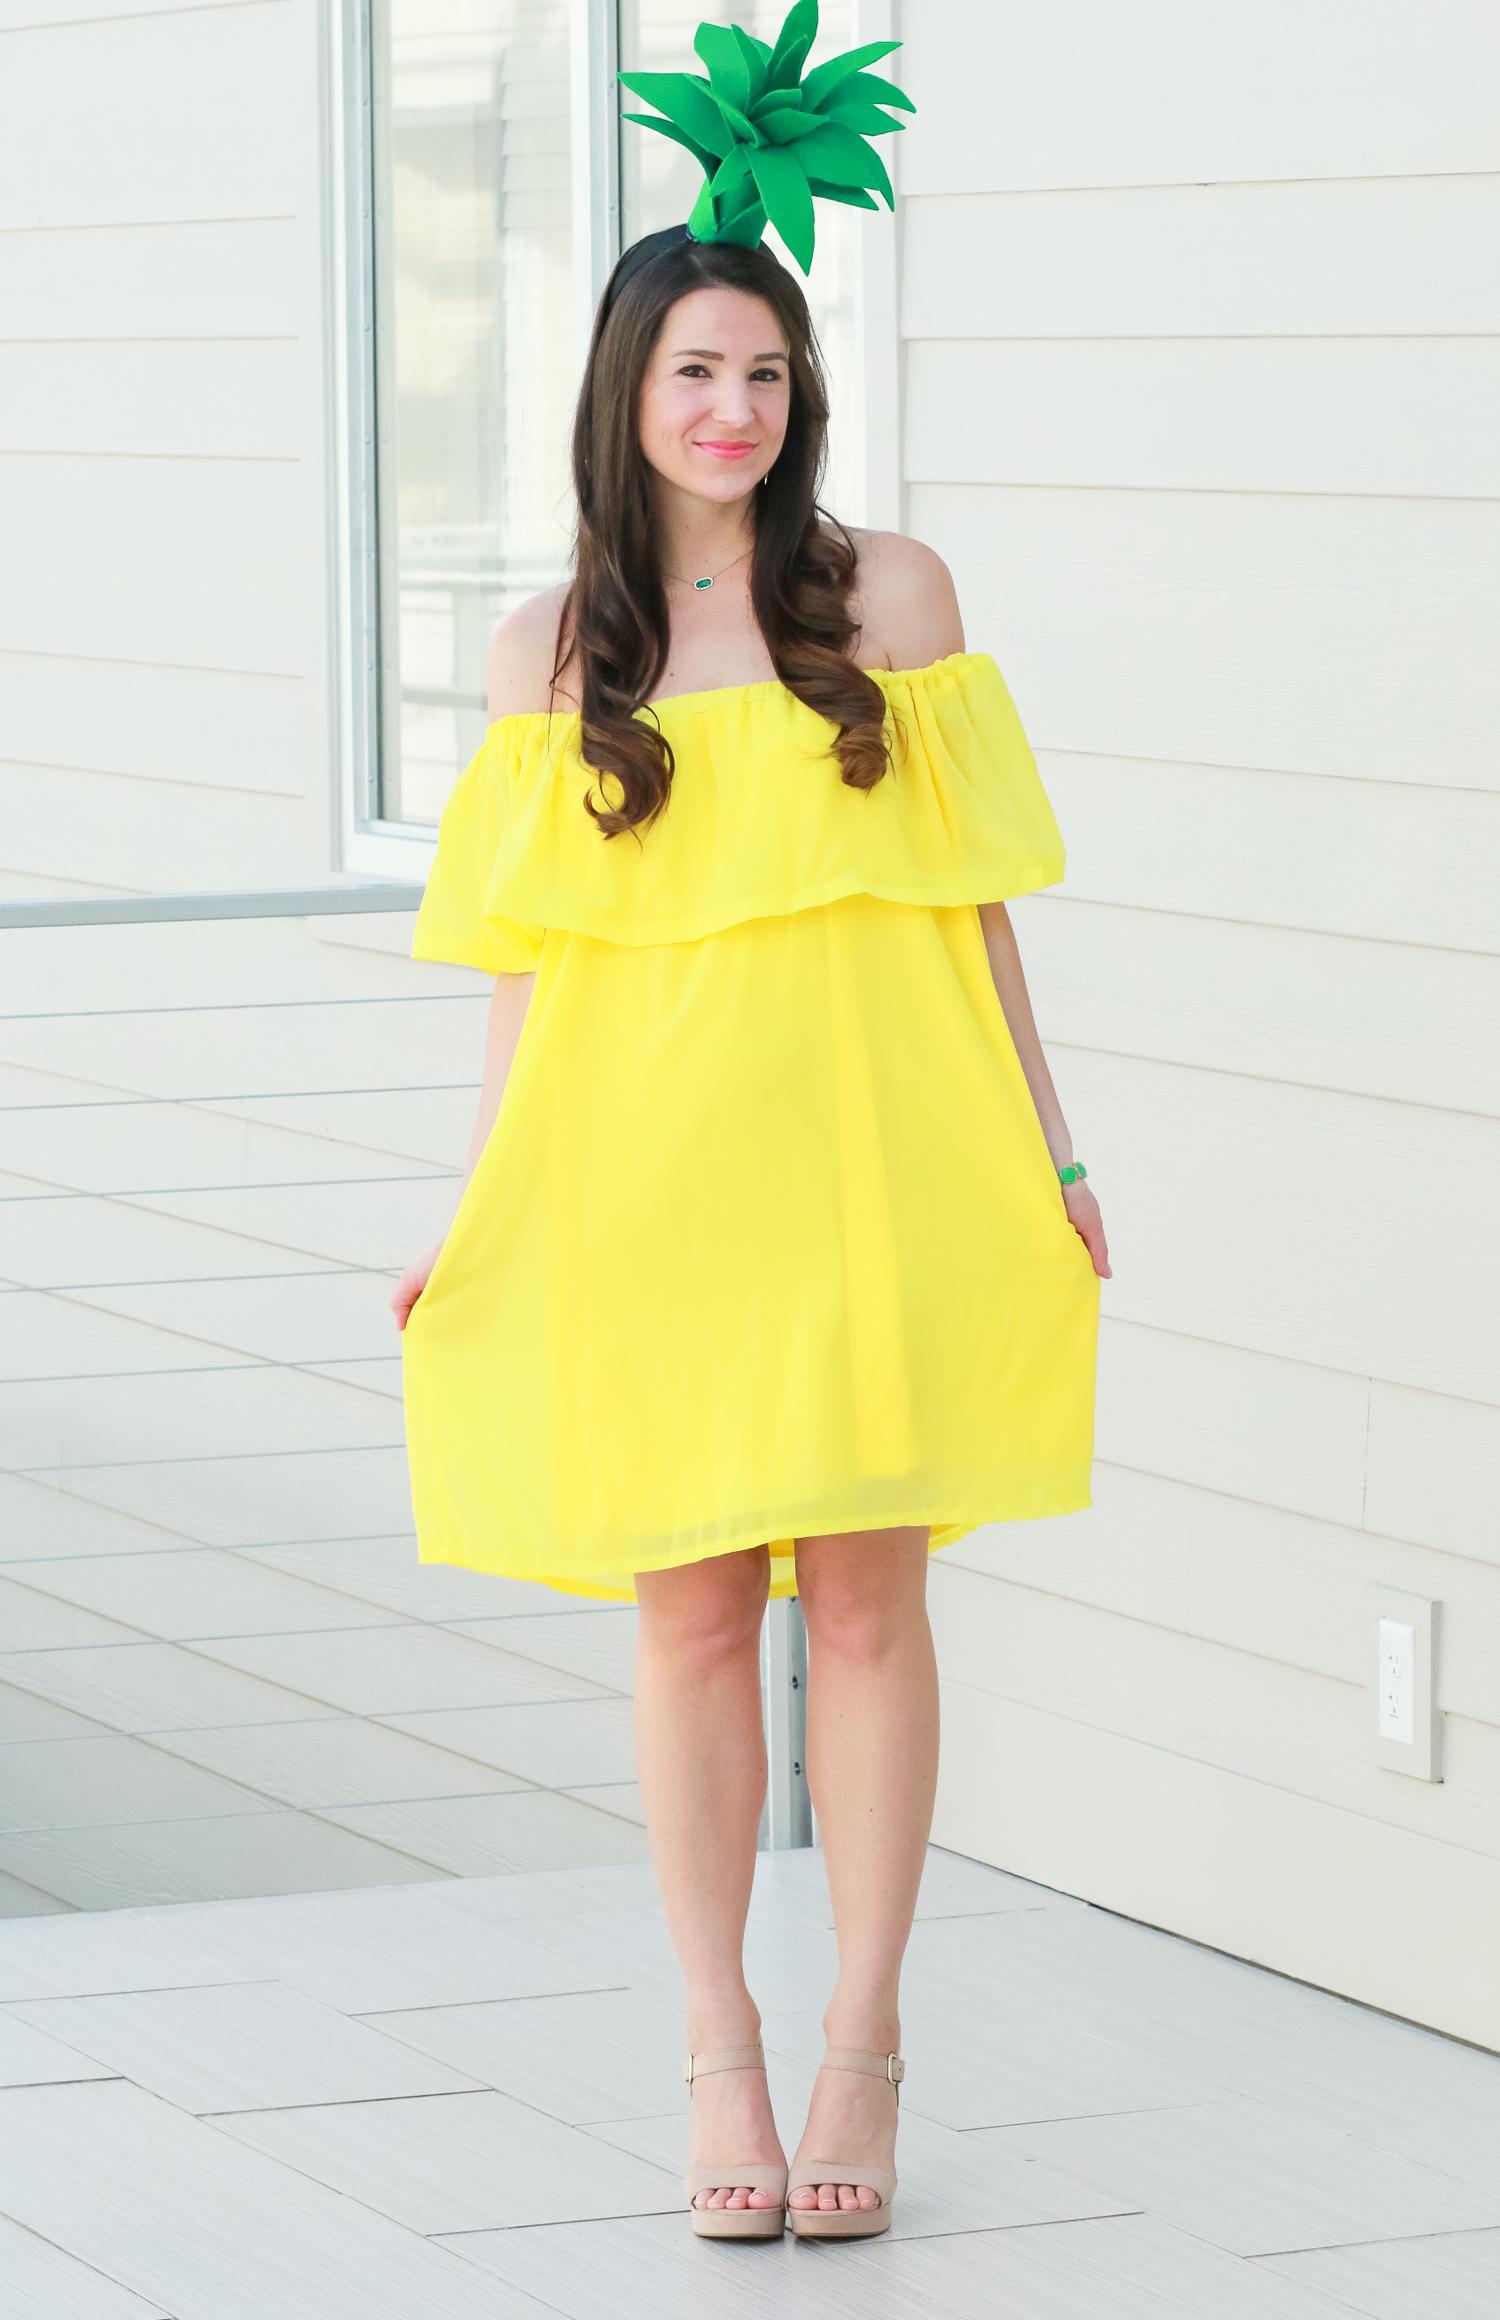 diy-pineapple-costume-33.jpg